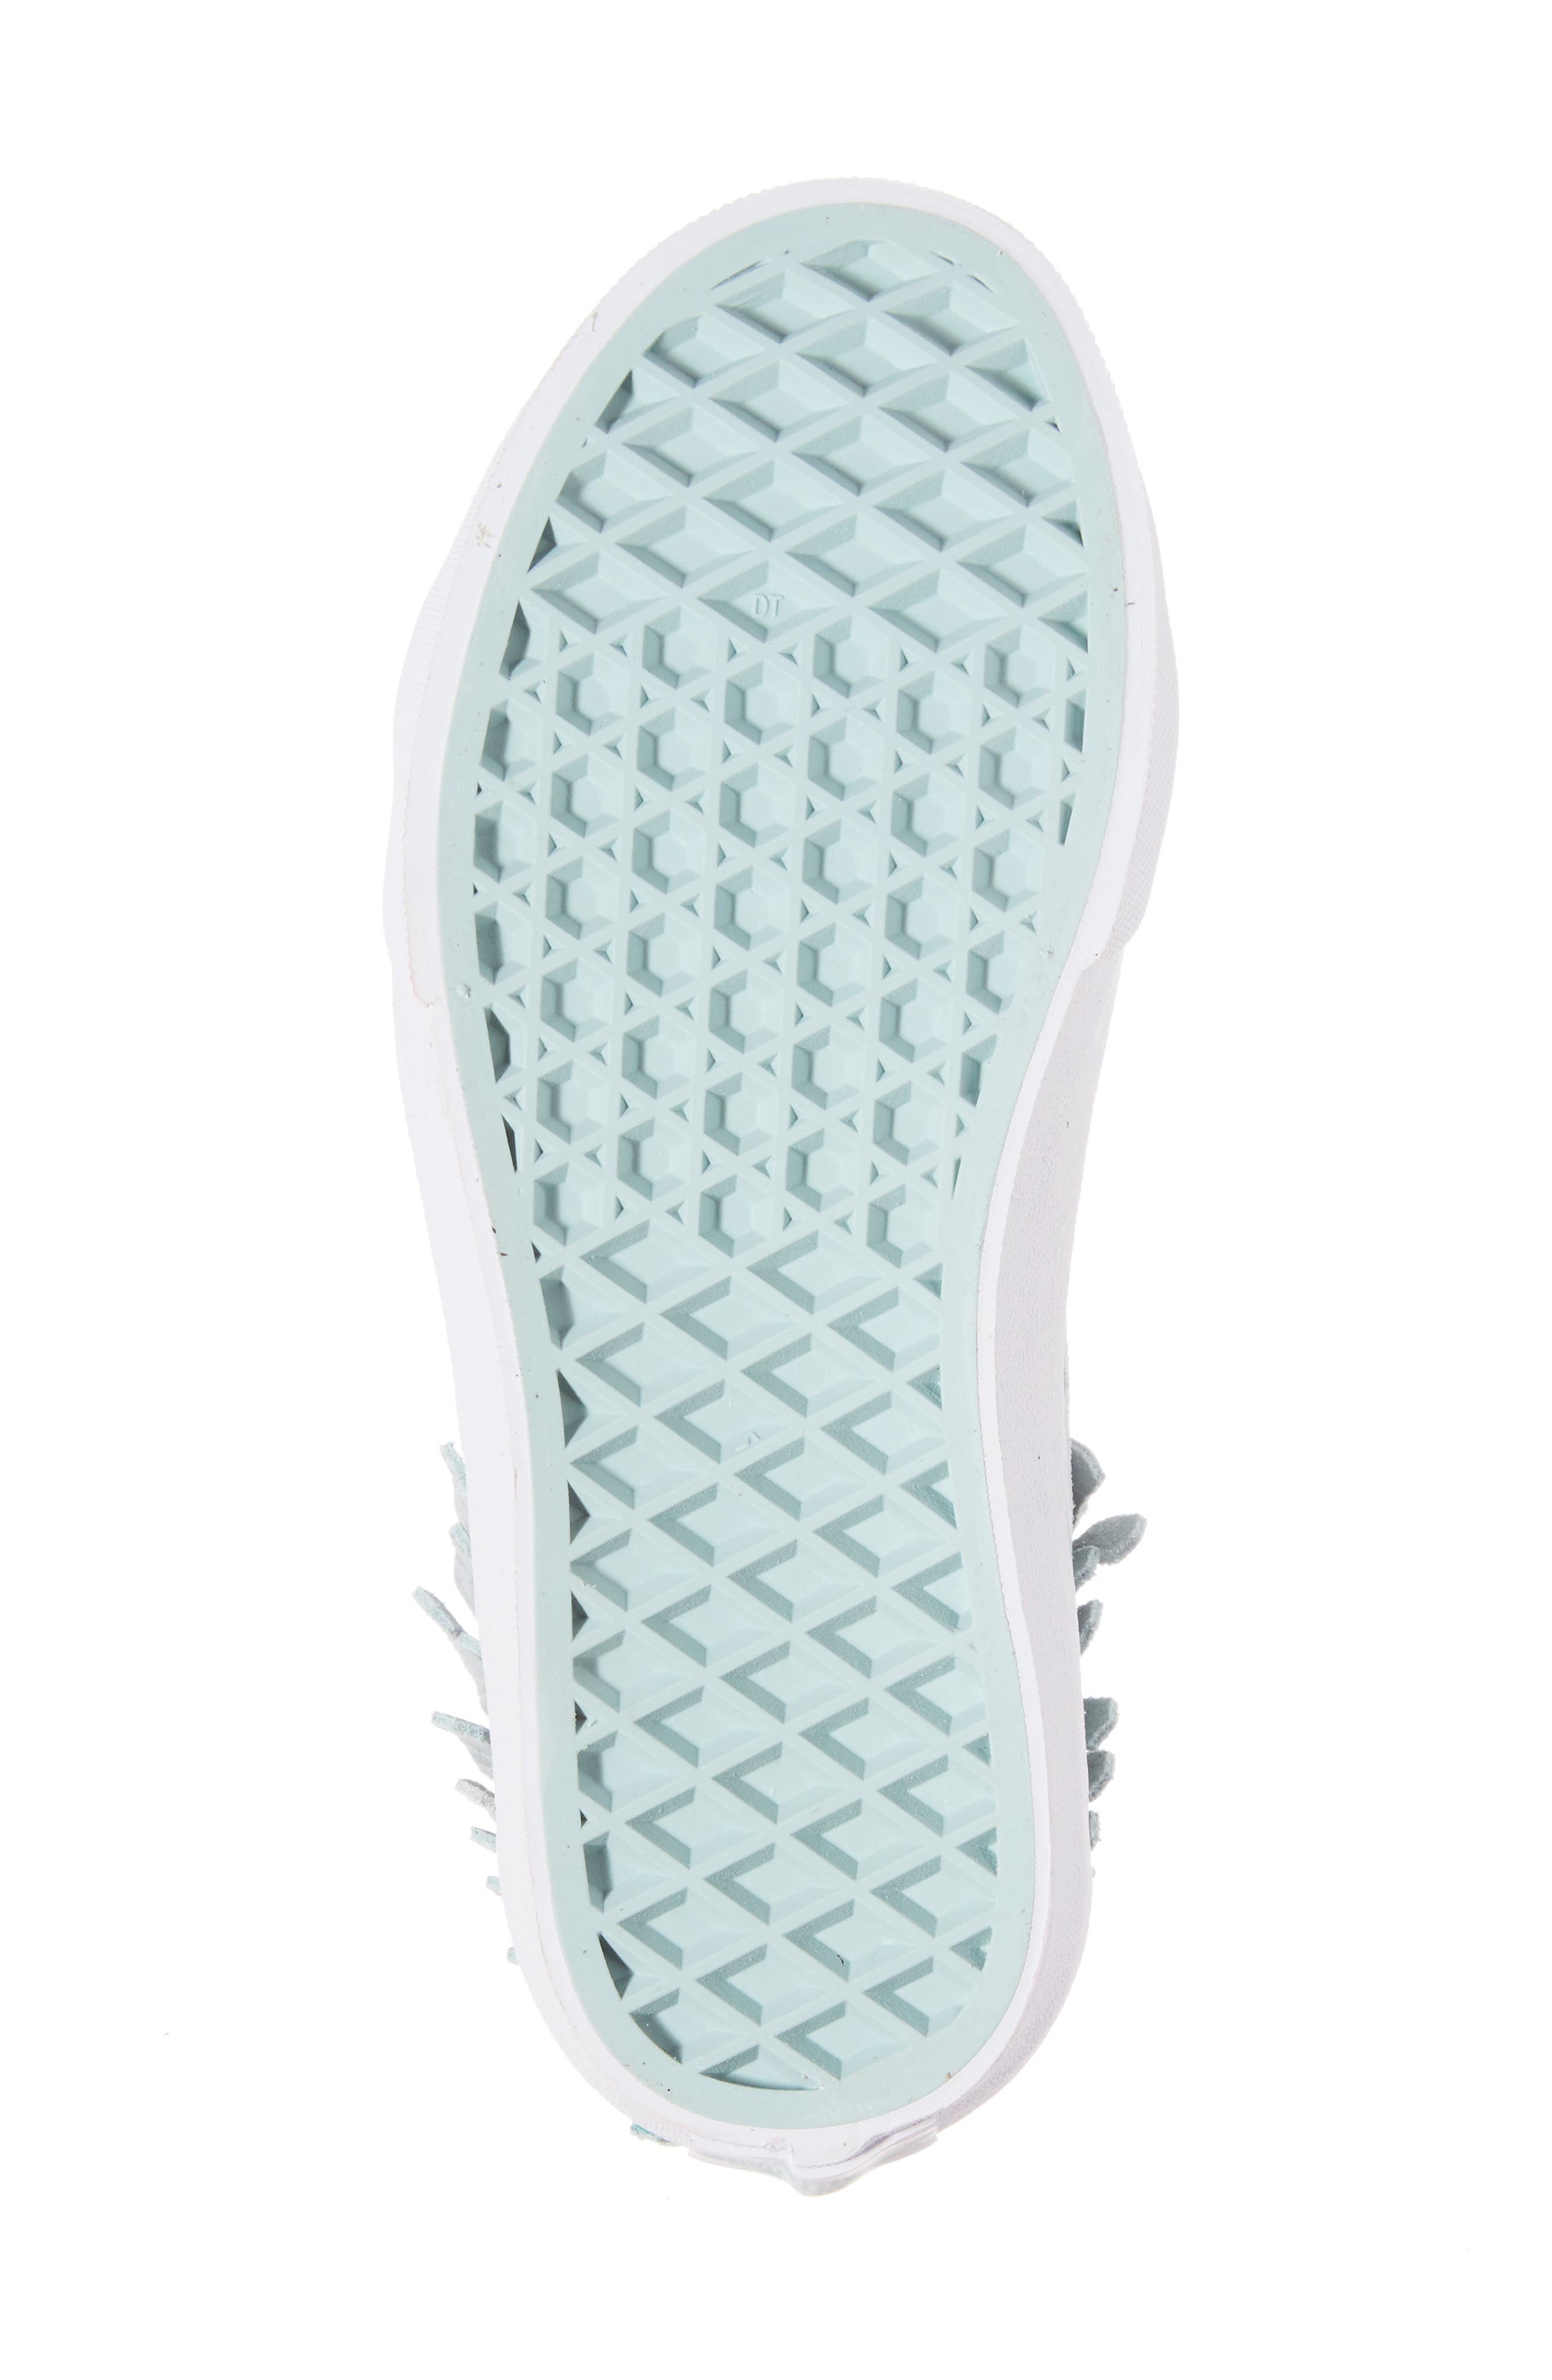 Chukka V Moc Sneaker,                             Alternate thumbnail 6, color,                             Harbor Gray Leopard Suede